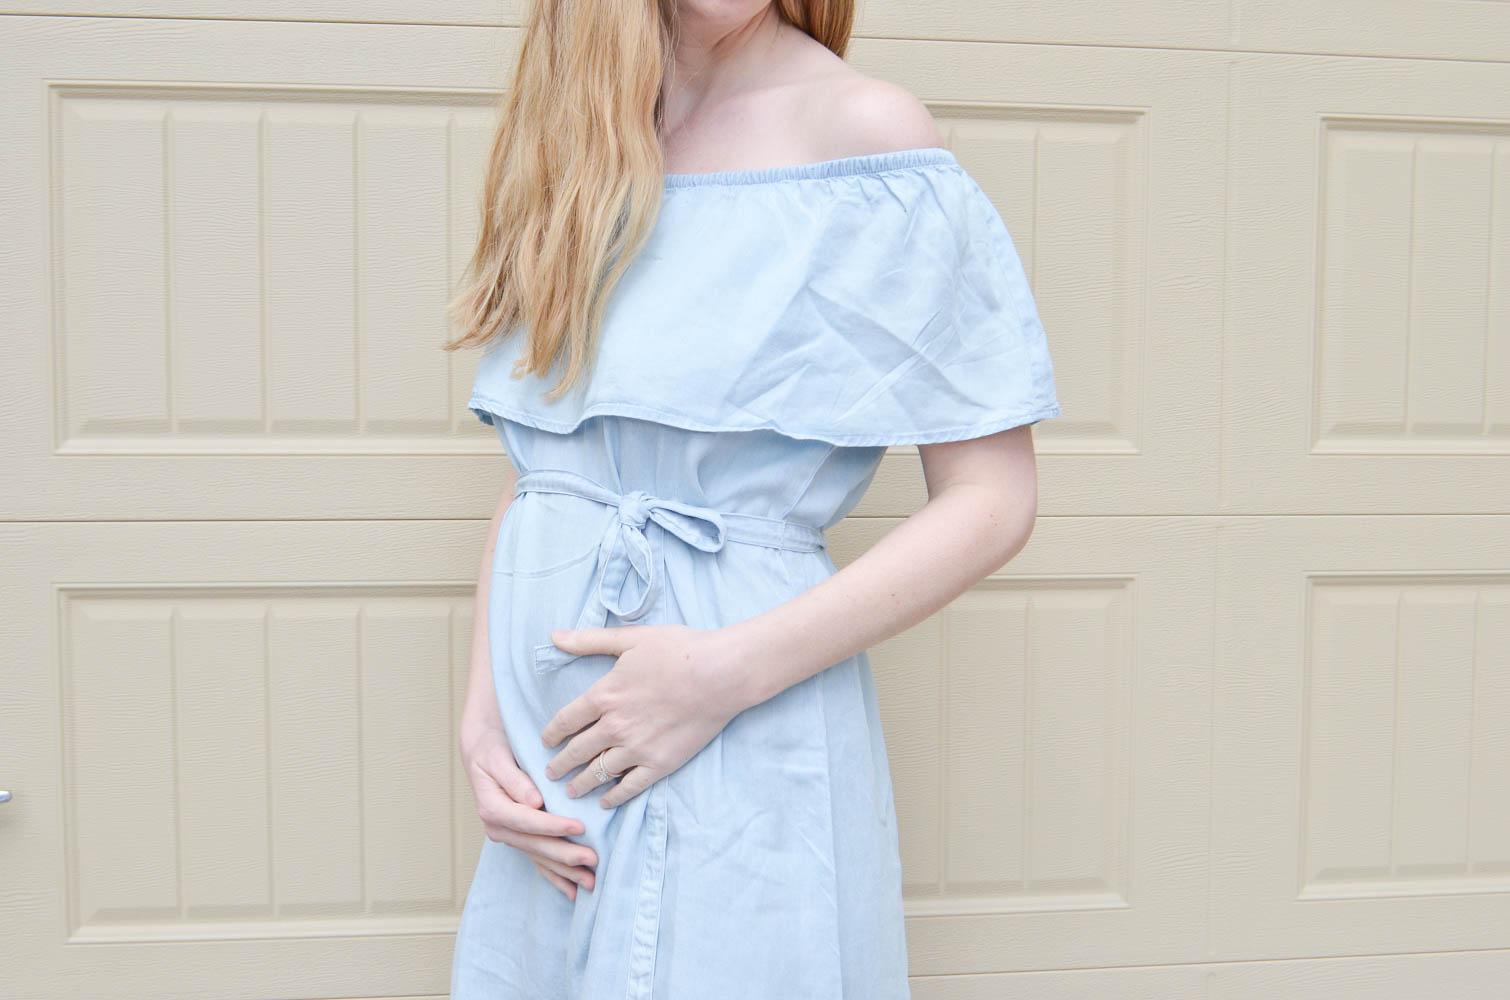 Pregnancy Weeks 11 - 16 | Pregnancy Announcement | Pregnancy Journal | Pregnancy Bump | Bump Pictures